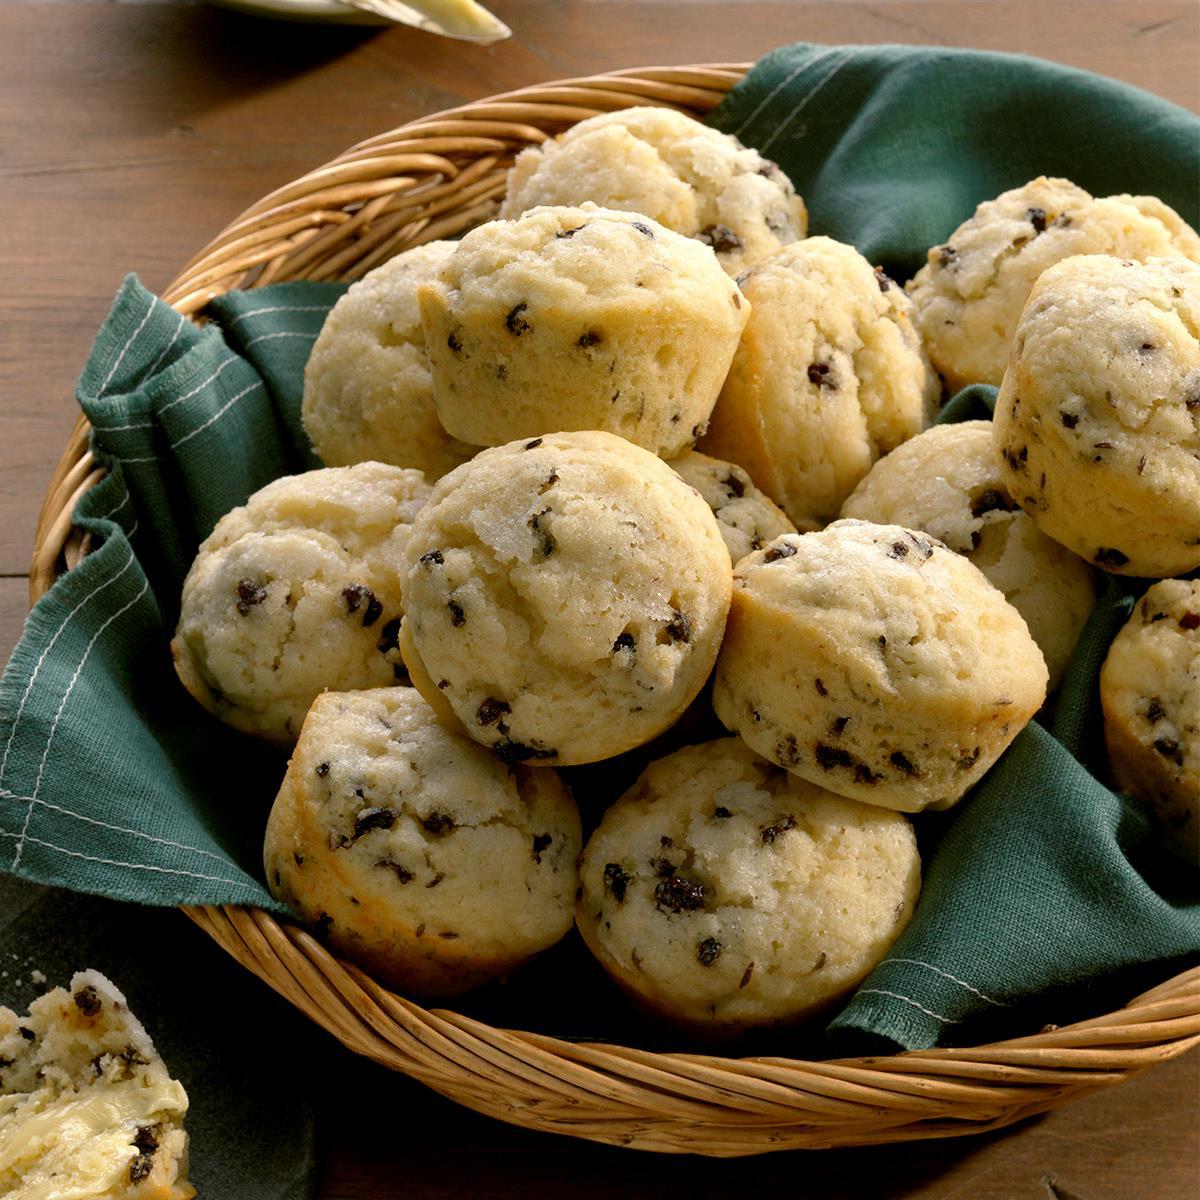 Irish Soda Bread Muffins Exps Tohfm19 32056 B09 24 5b 5